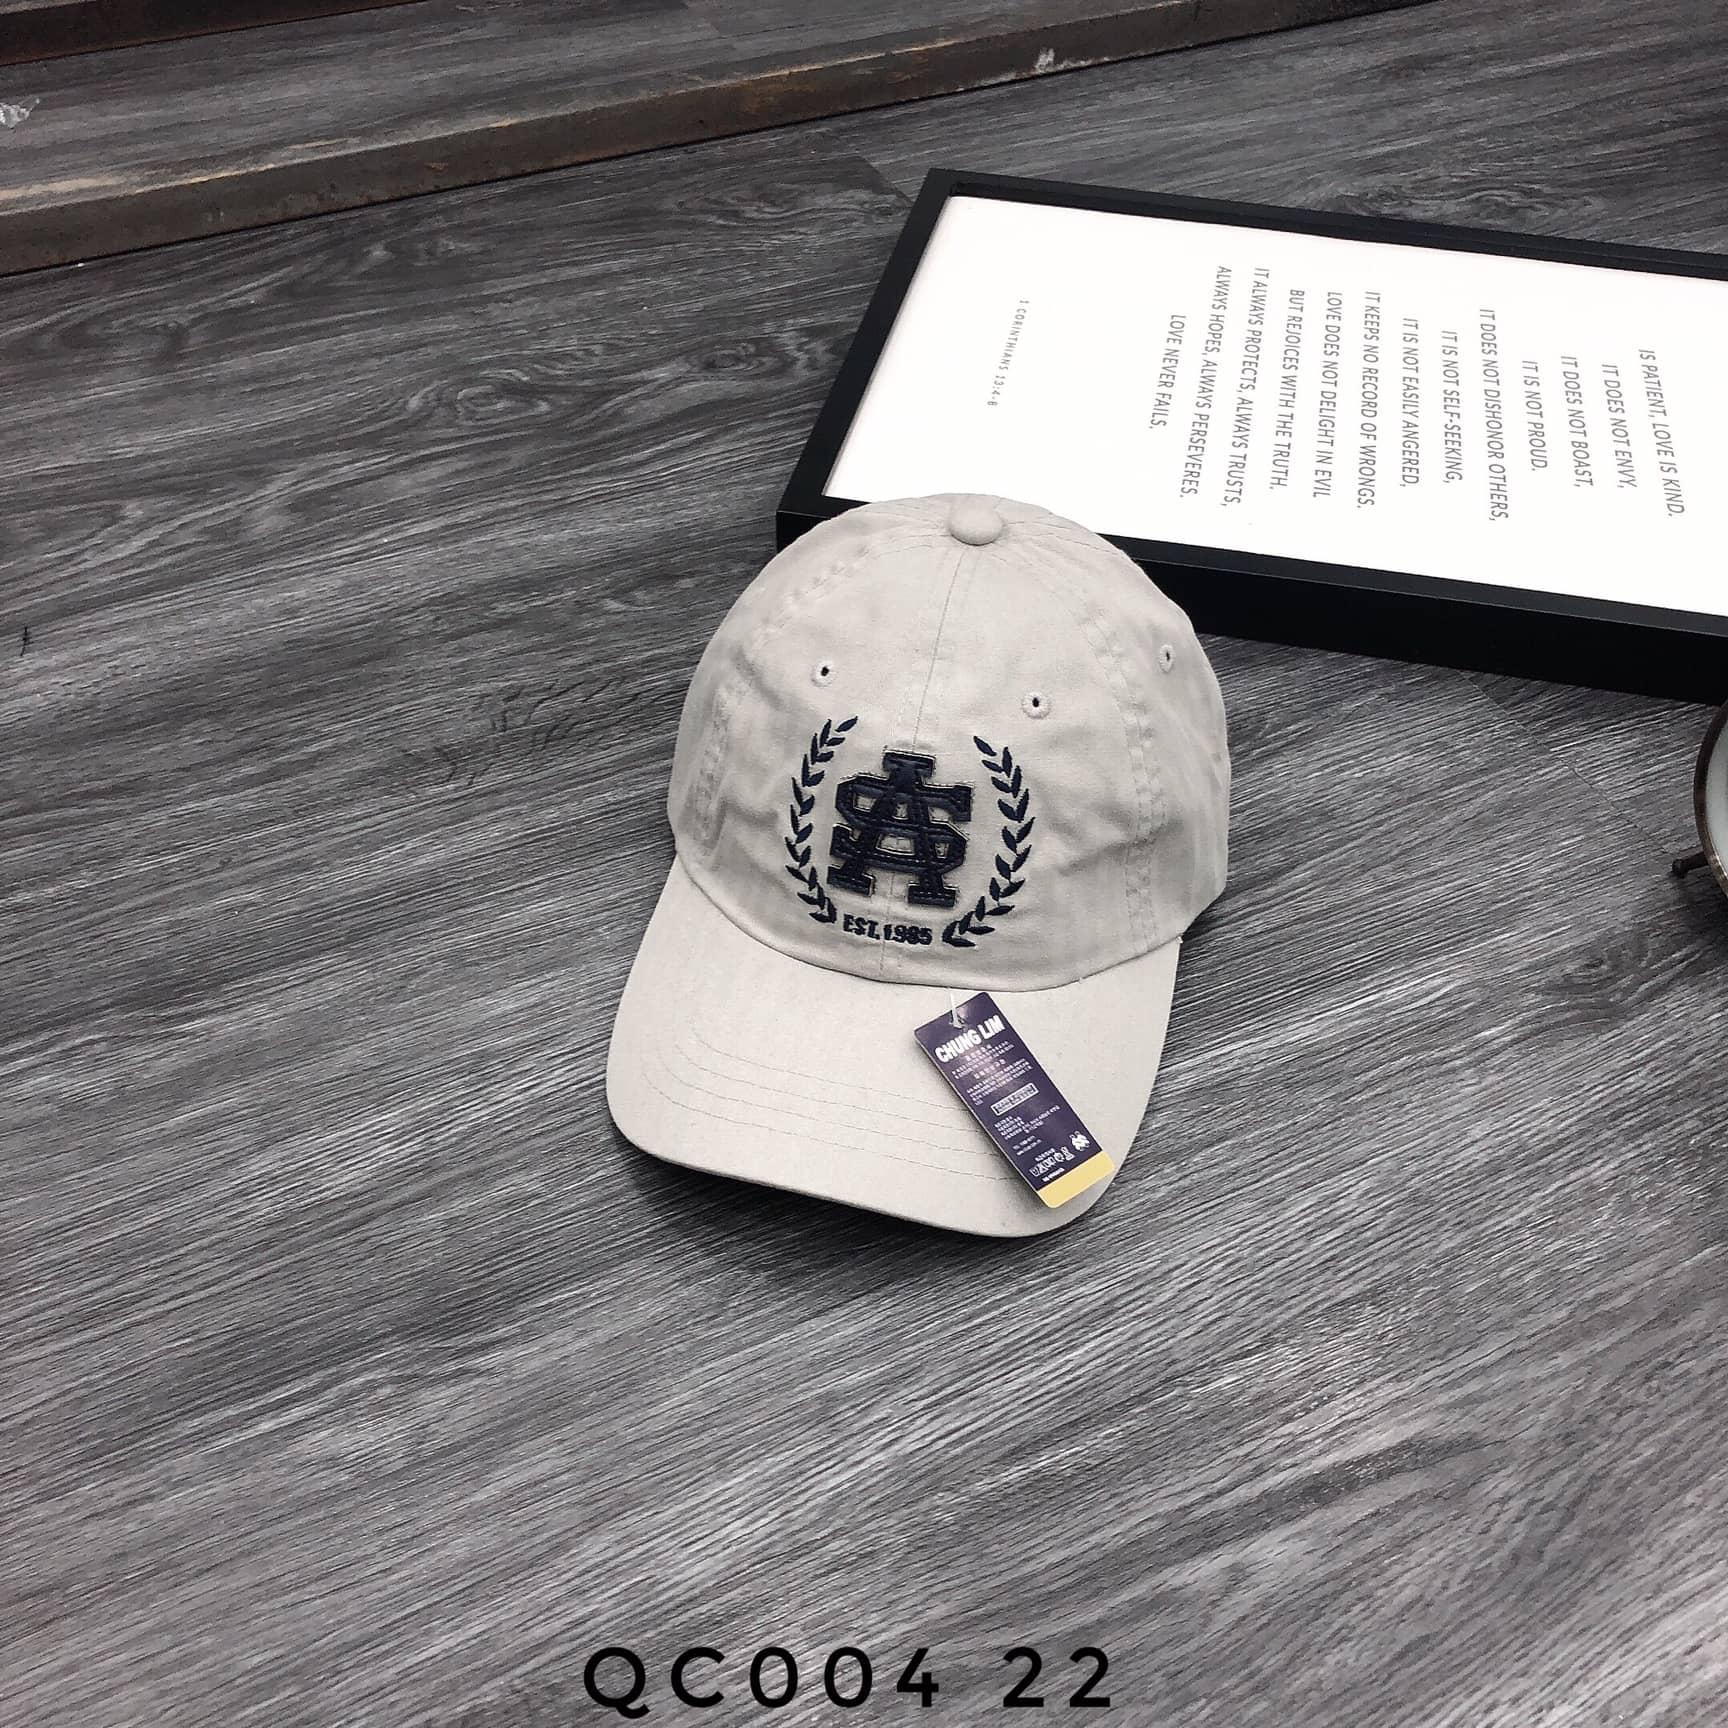 NÓN QC004